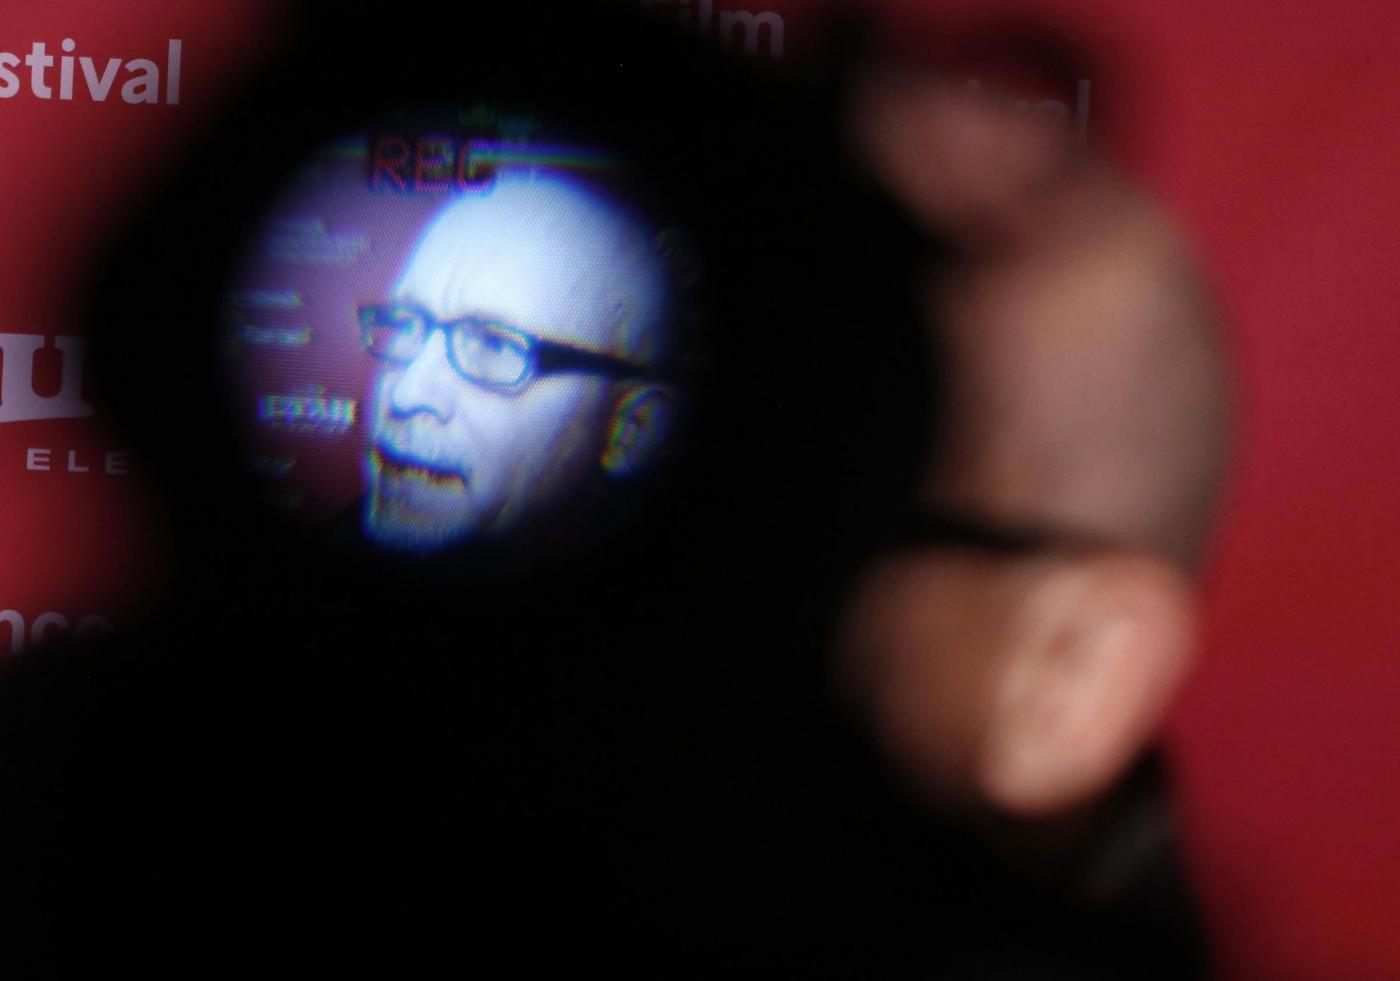 Scientology contro Alex Gibney per il documentario «Going Clear»